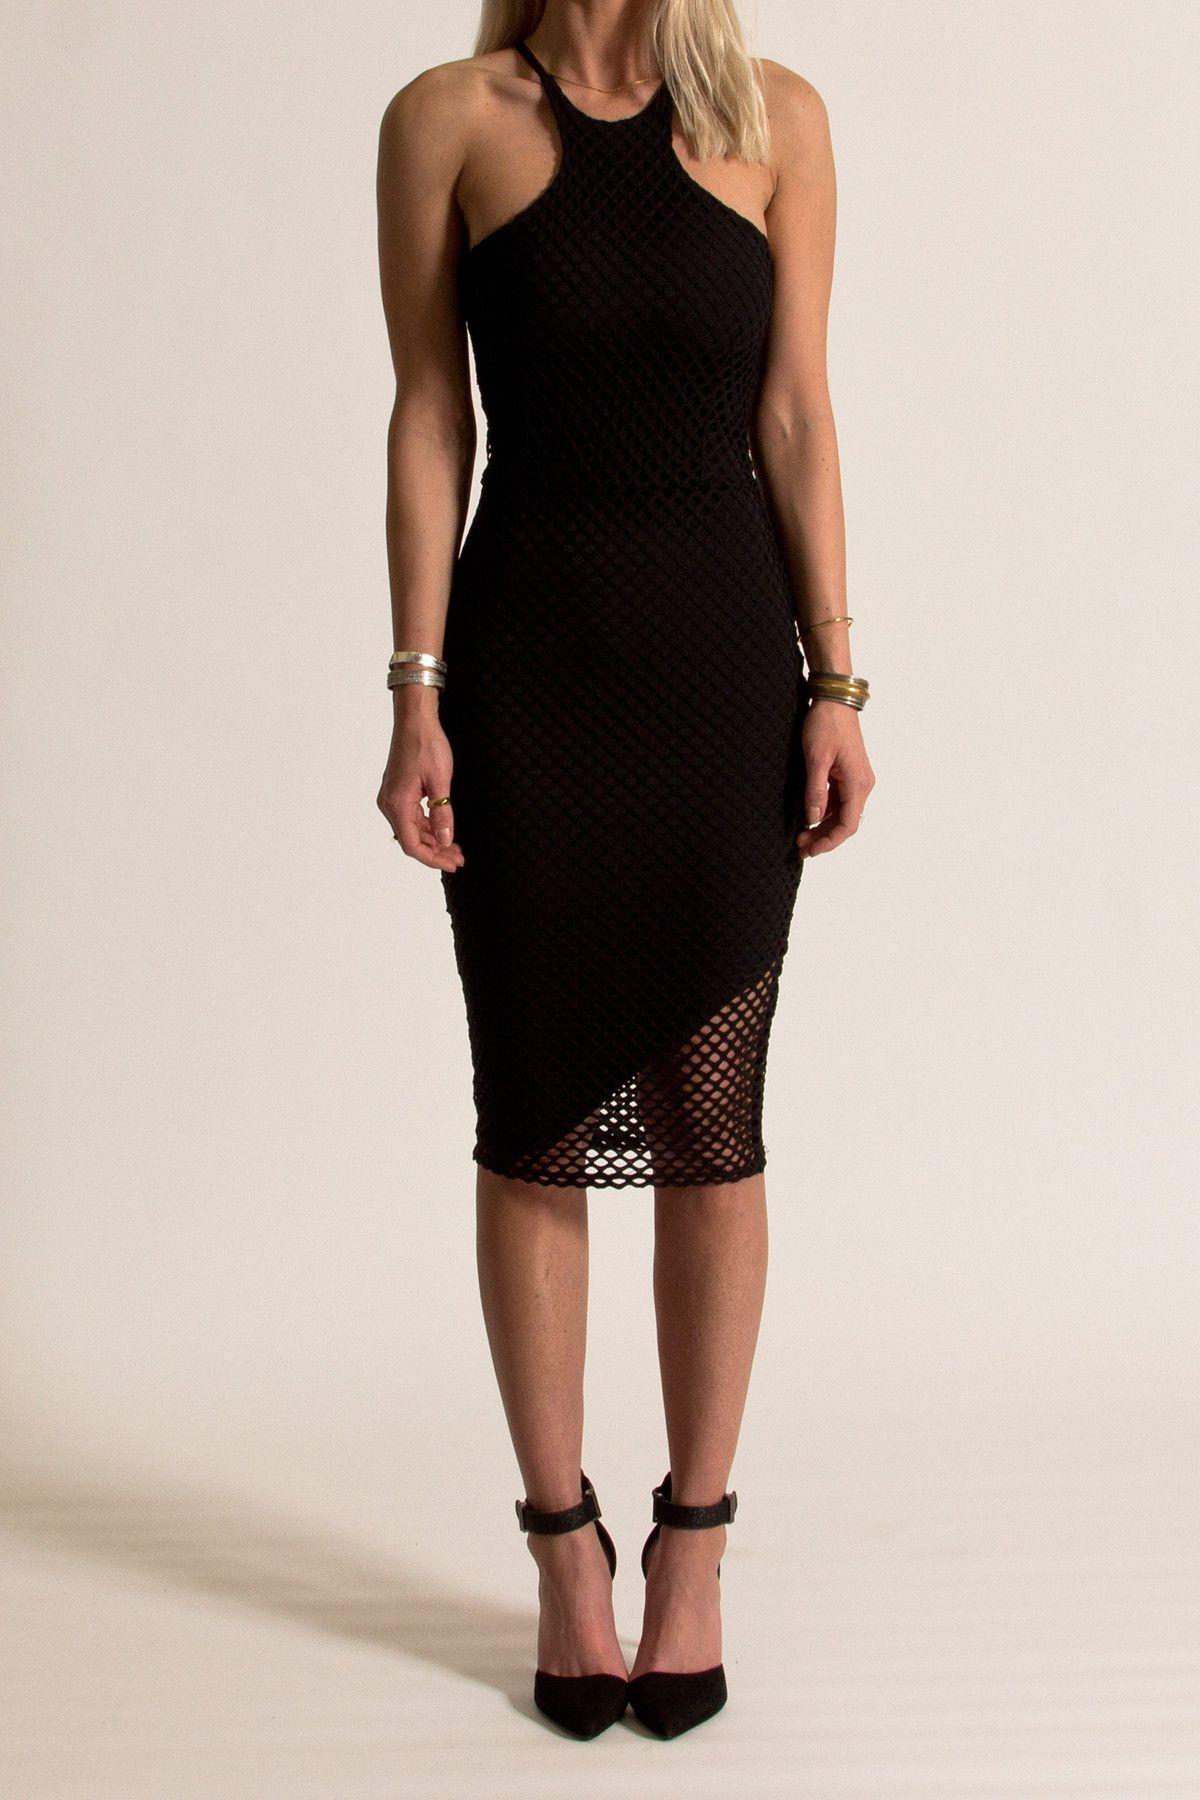 Pin On Life In A Little Black Dress [ 1800 x 1200 Pixel ]